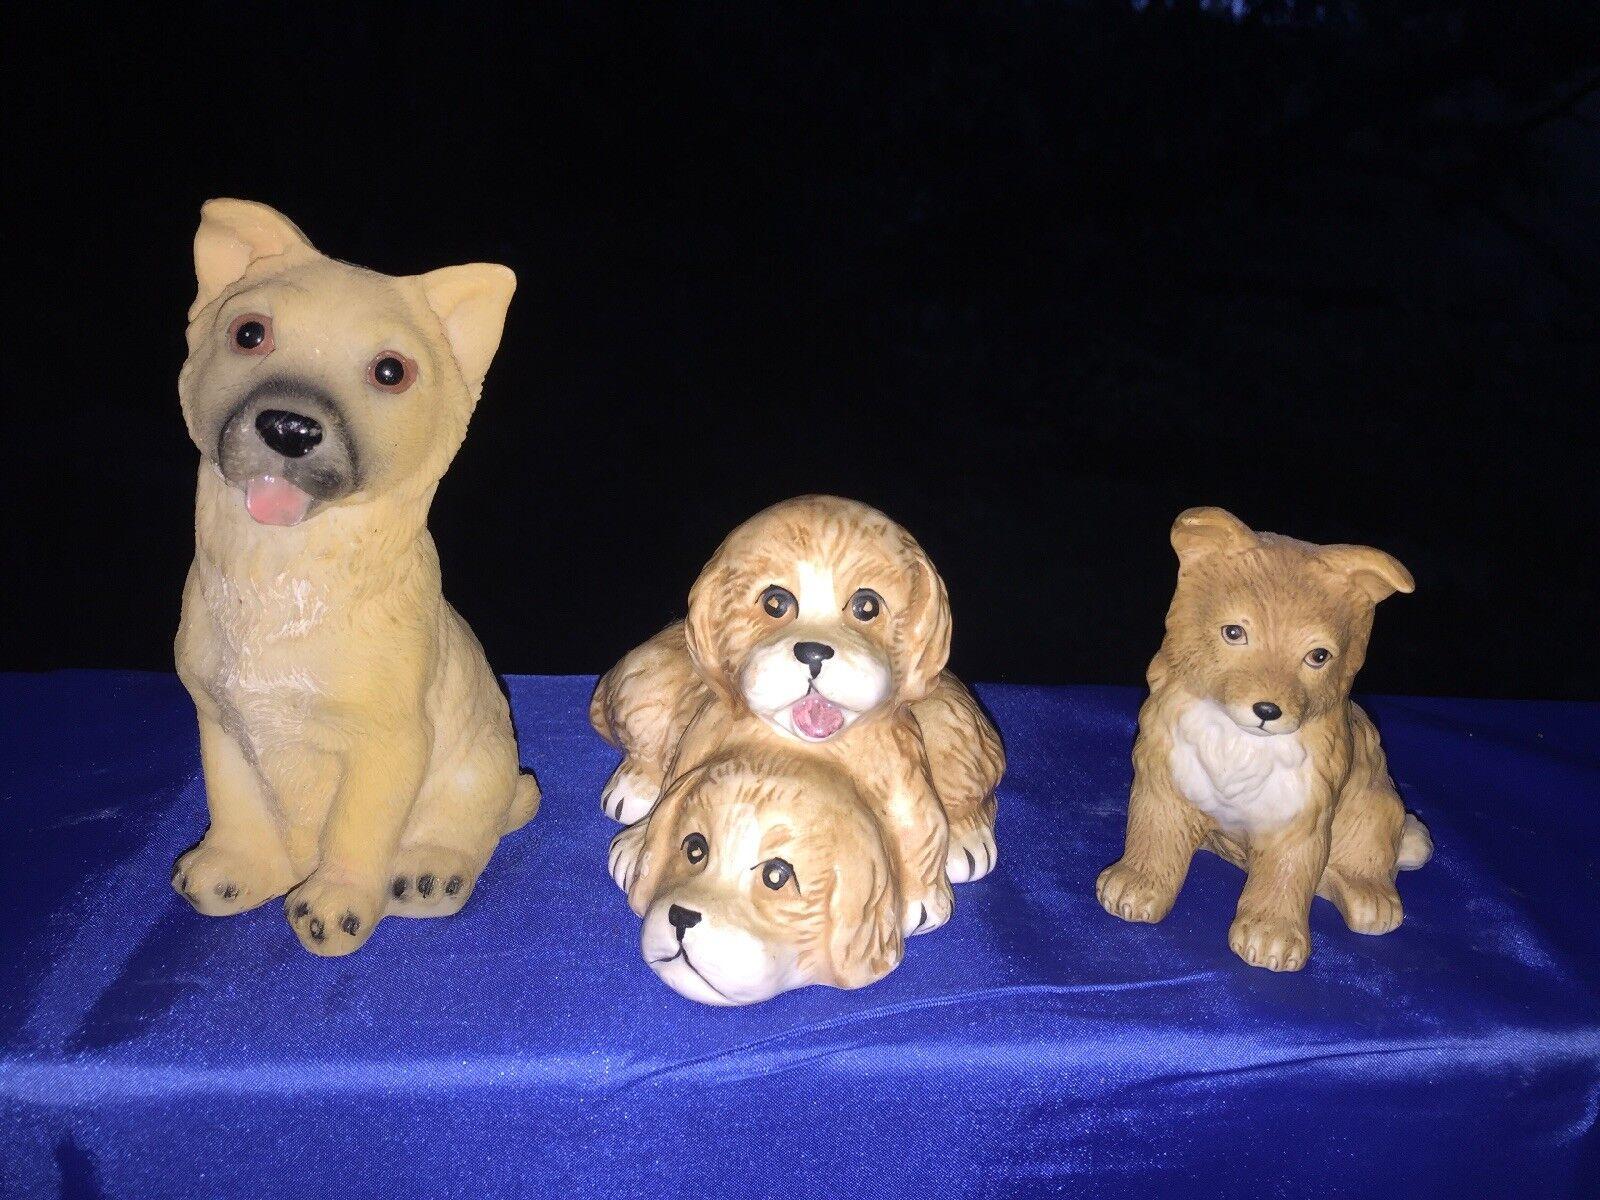 Vintage berger allemand collie lassie homco figurine set 3 unique chiens ❤️ j8